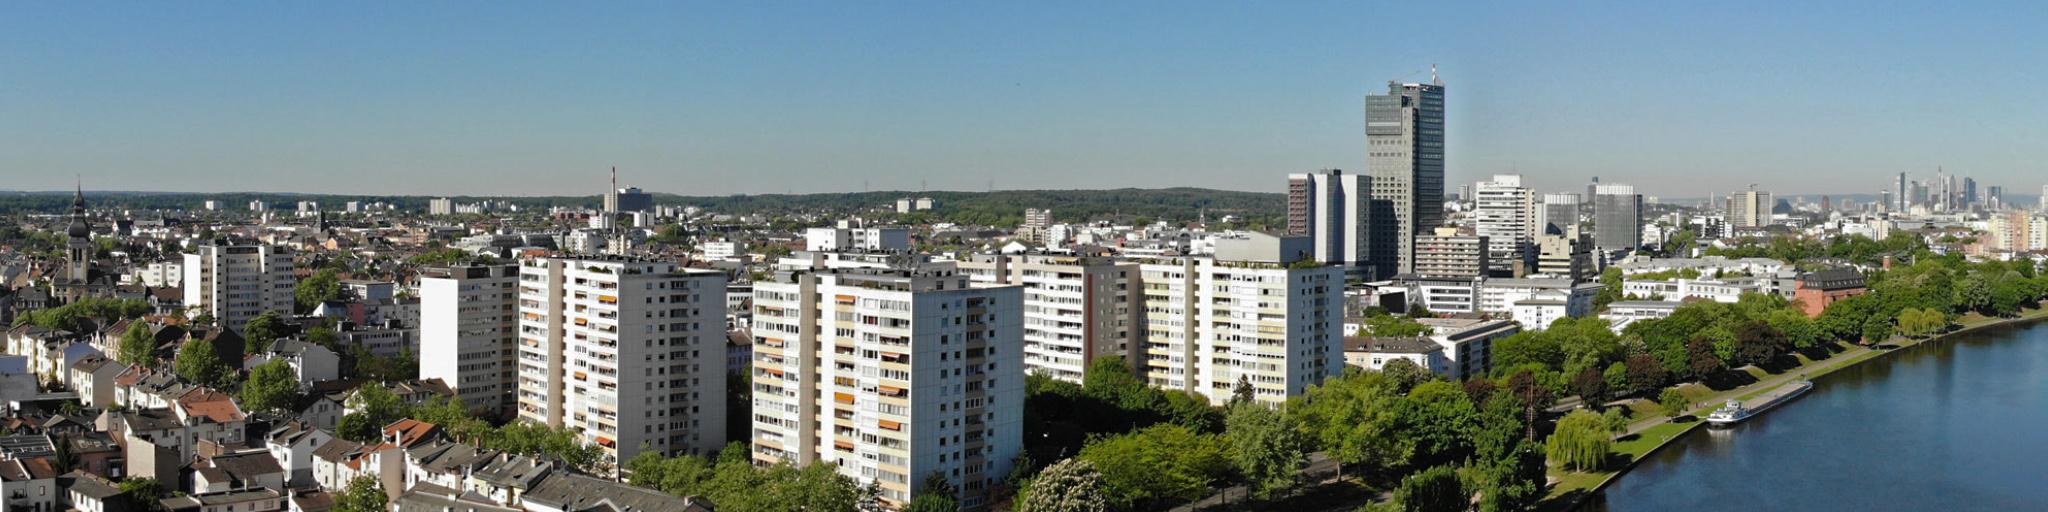 Panorama Offenbach am Main - Drohnenflug Offenbach - Luftbild Offenbach am Main - Skyline Offenbach - Hochhäuser Offenbach